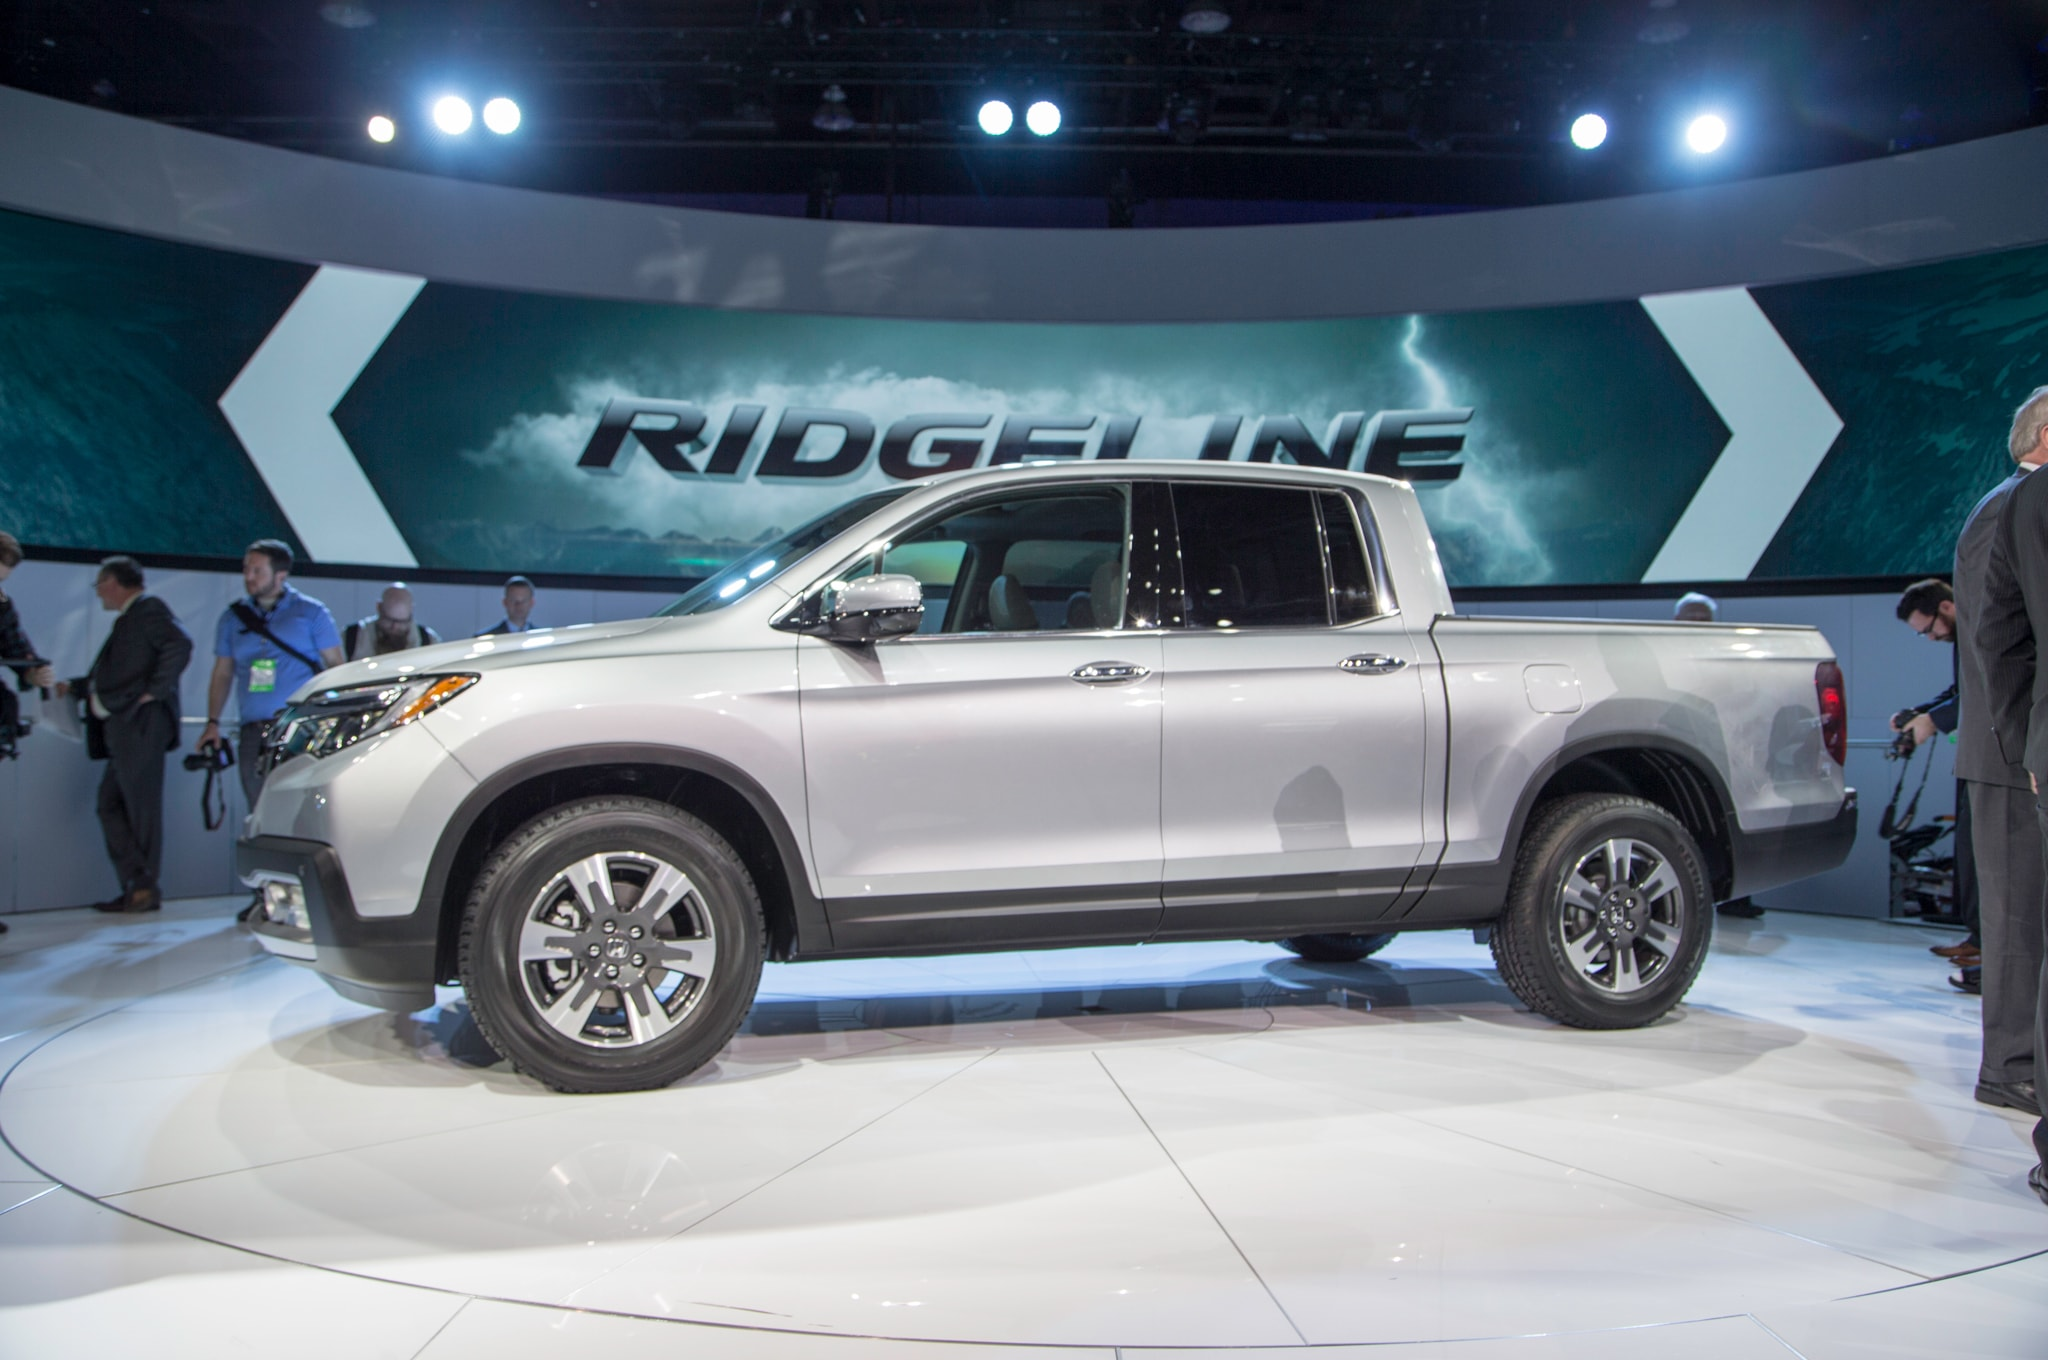 new smart car release dateSmart Honda  New Honda dealership in Des Moines IA 50325